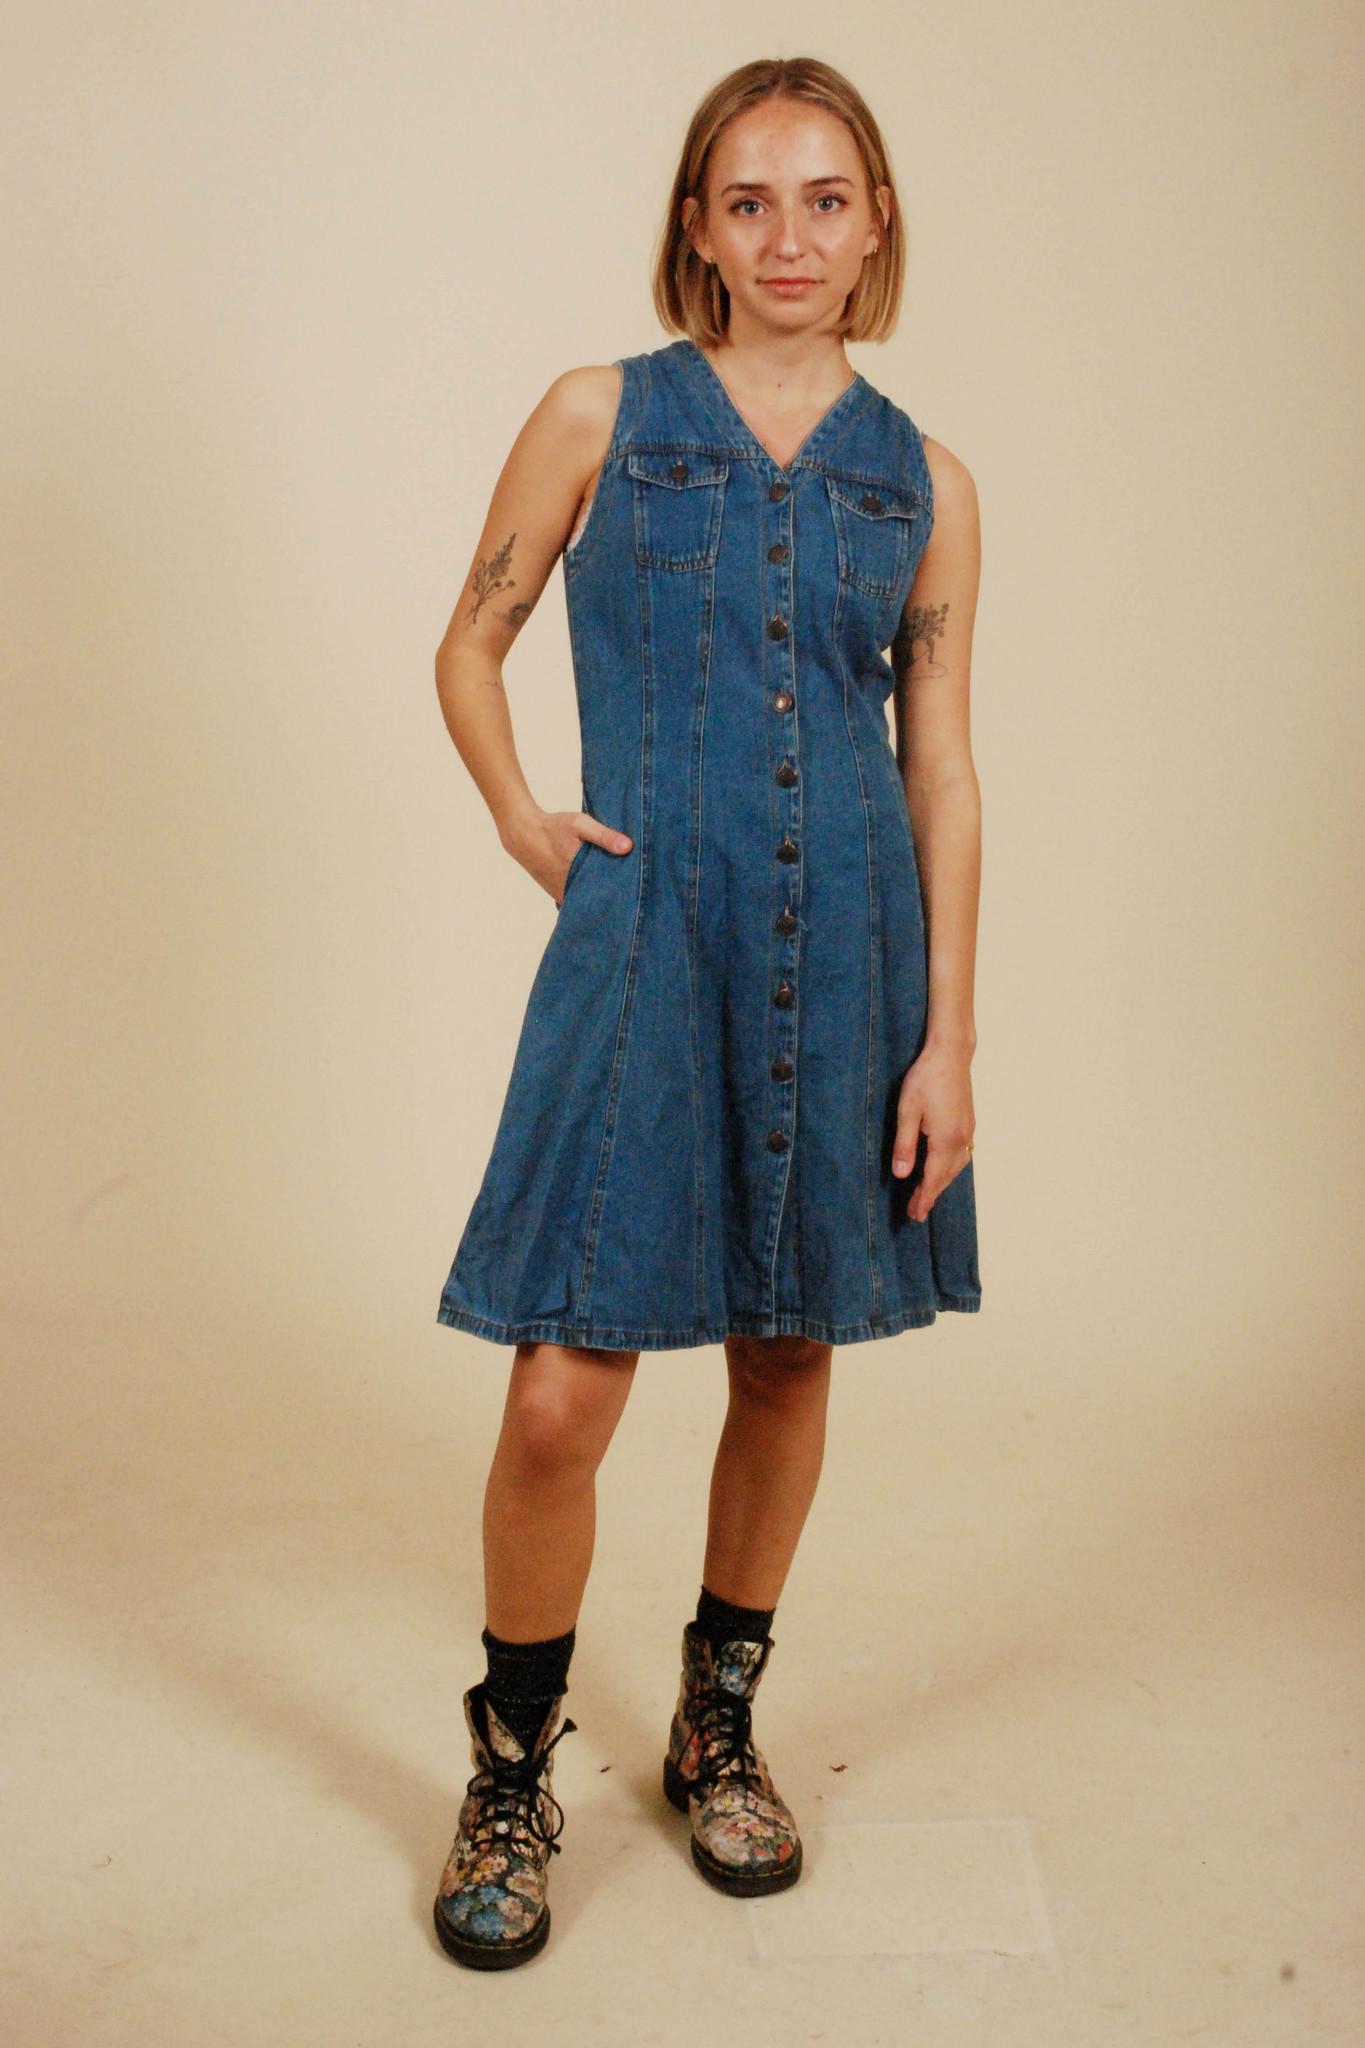 Classic 90s denim dress